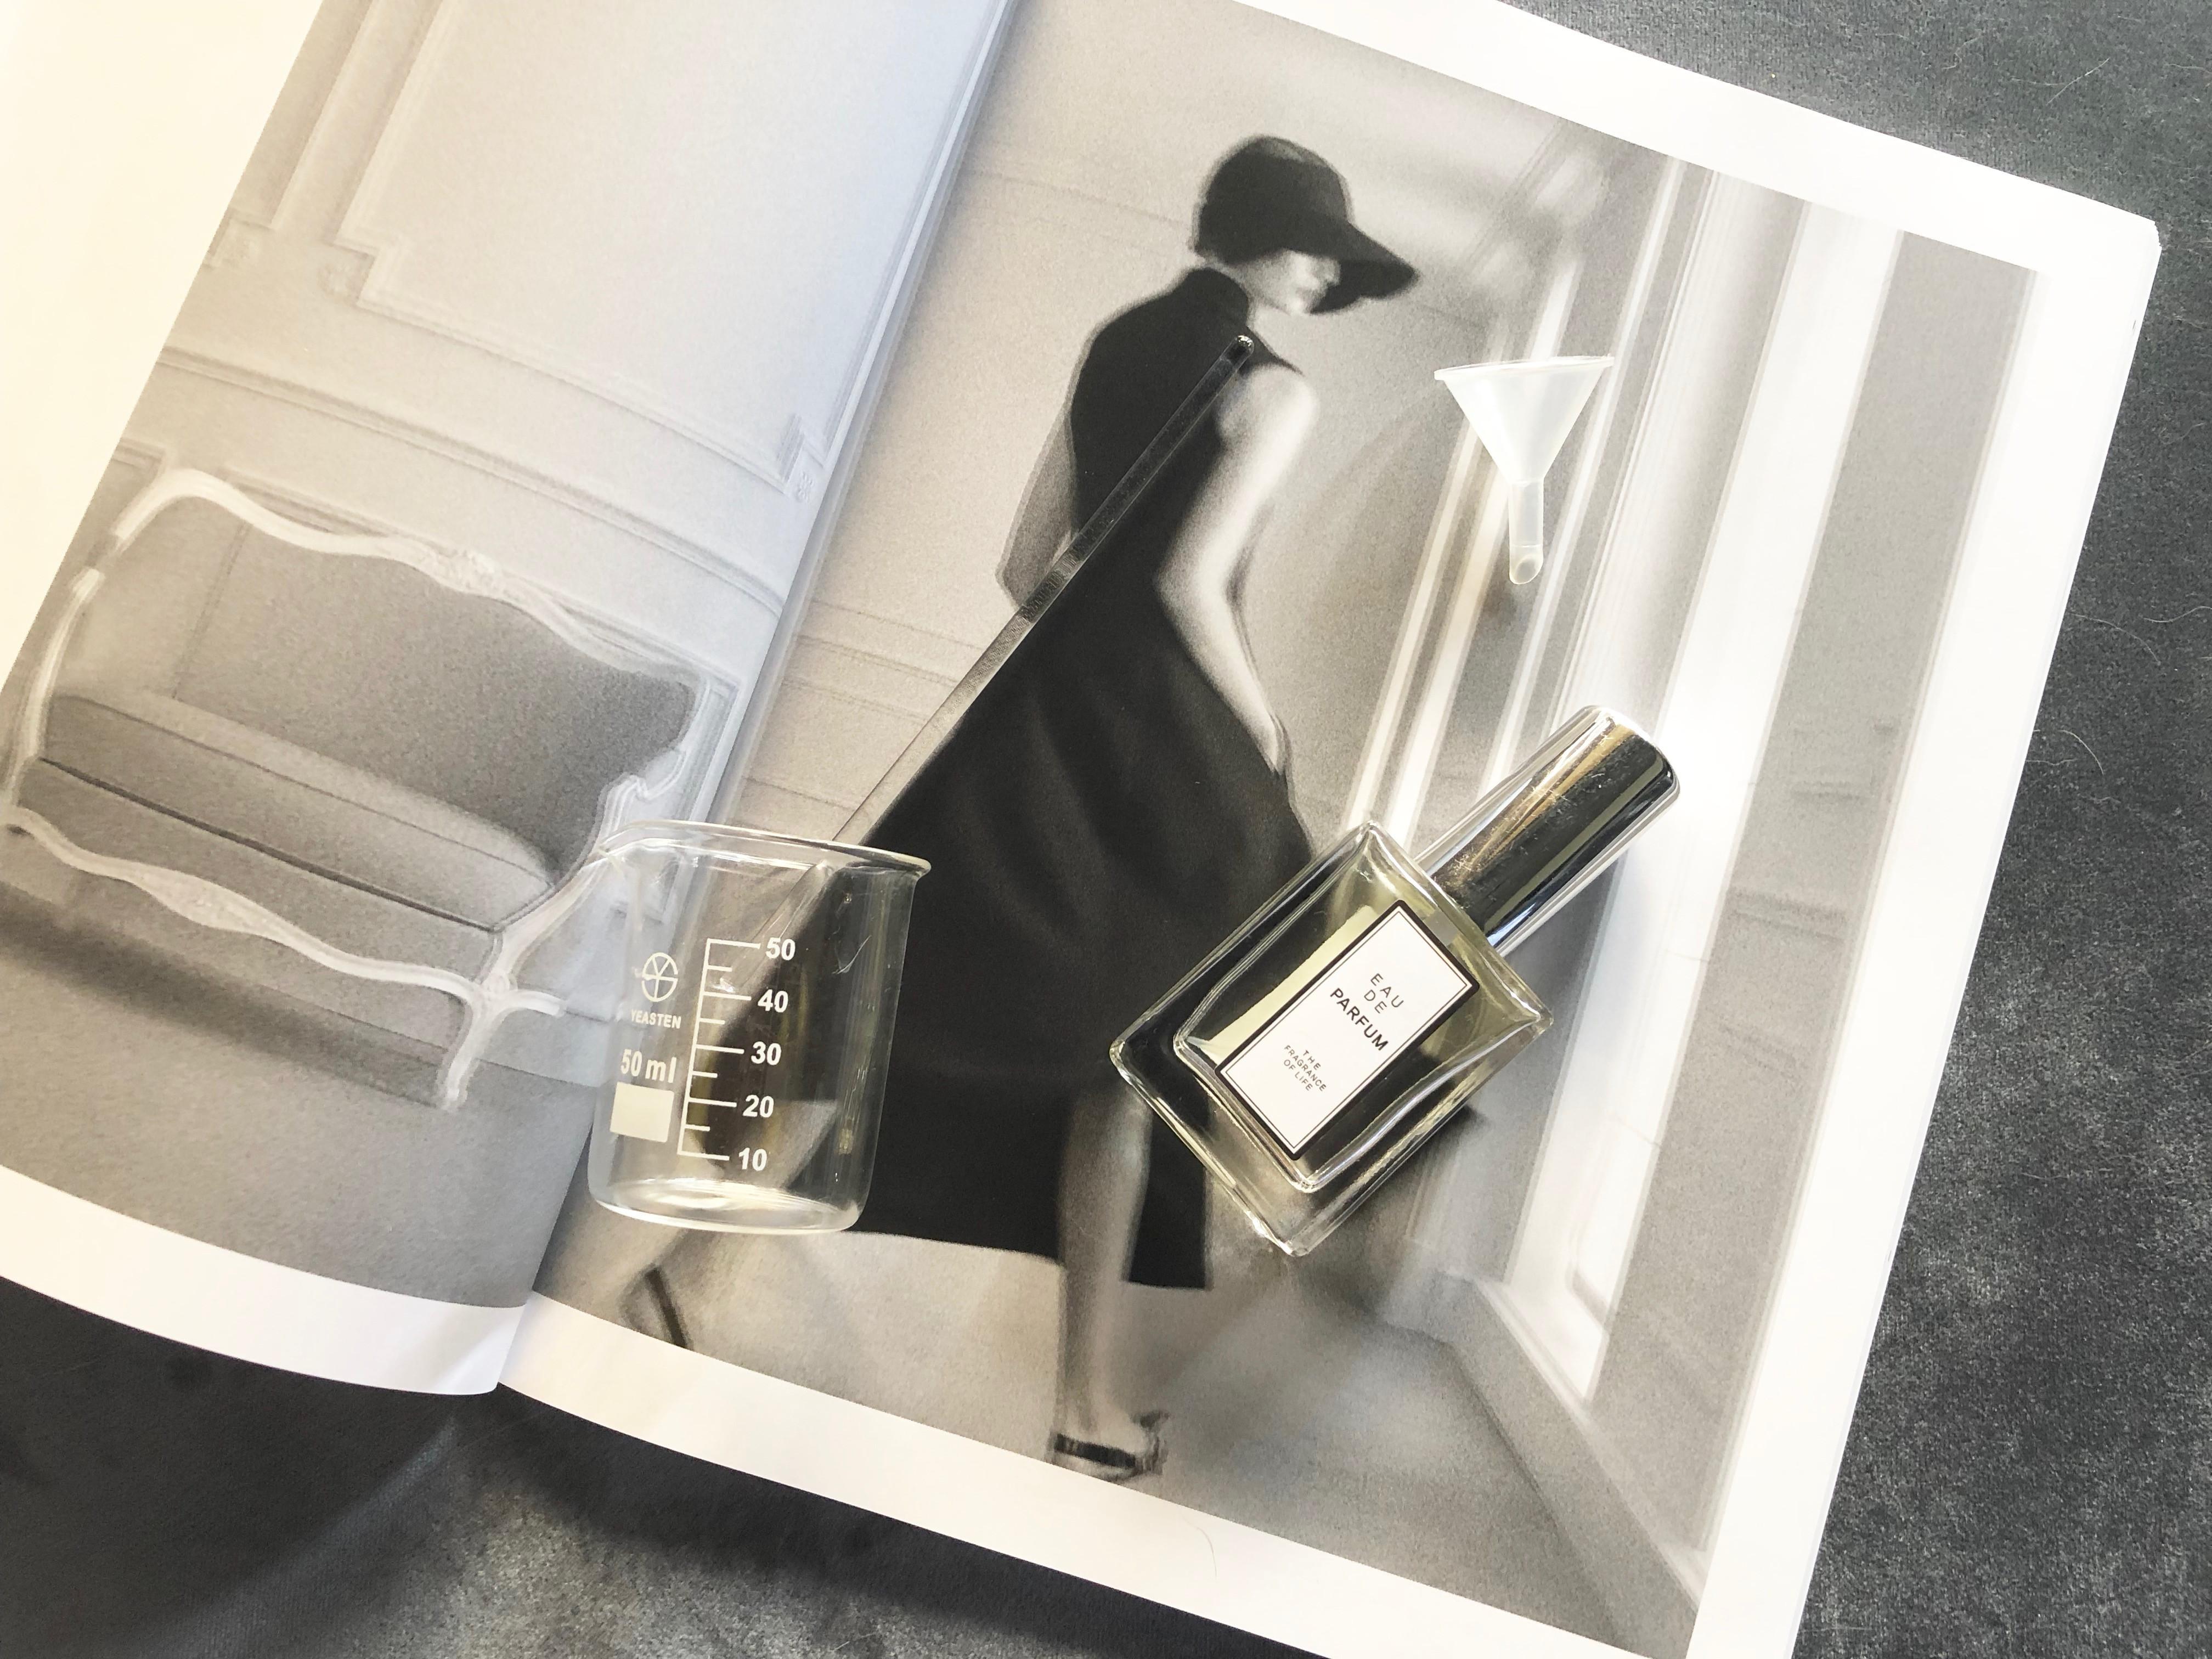 Discovery of perfume 香水體驗